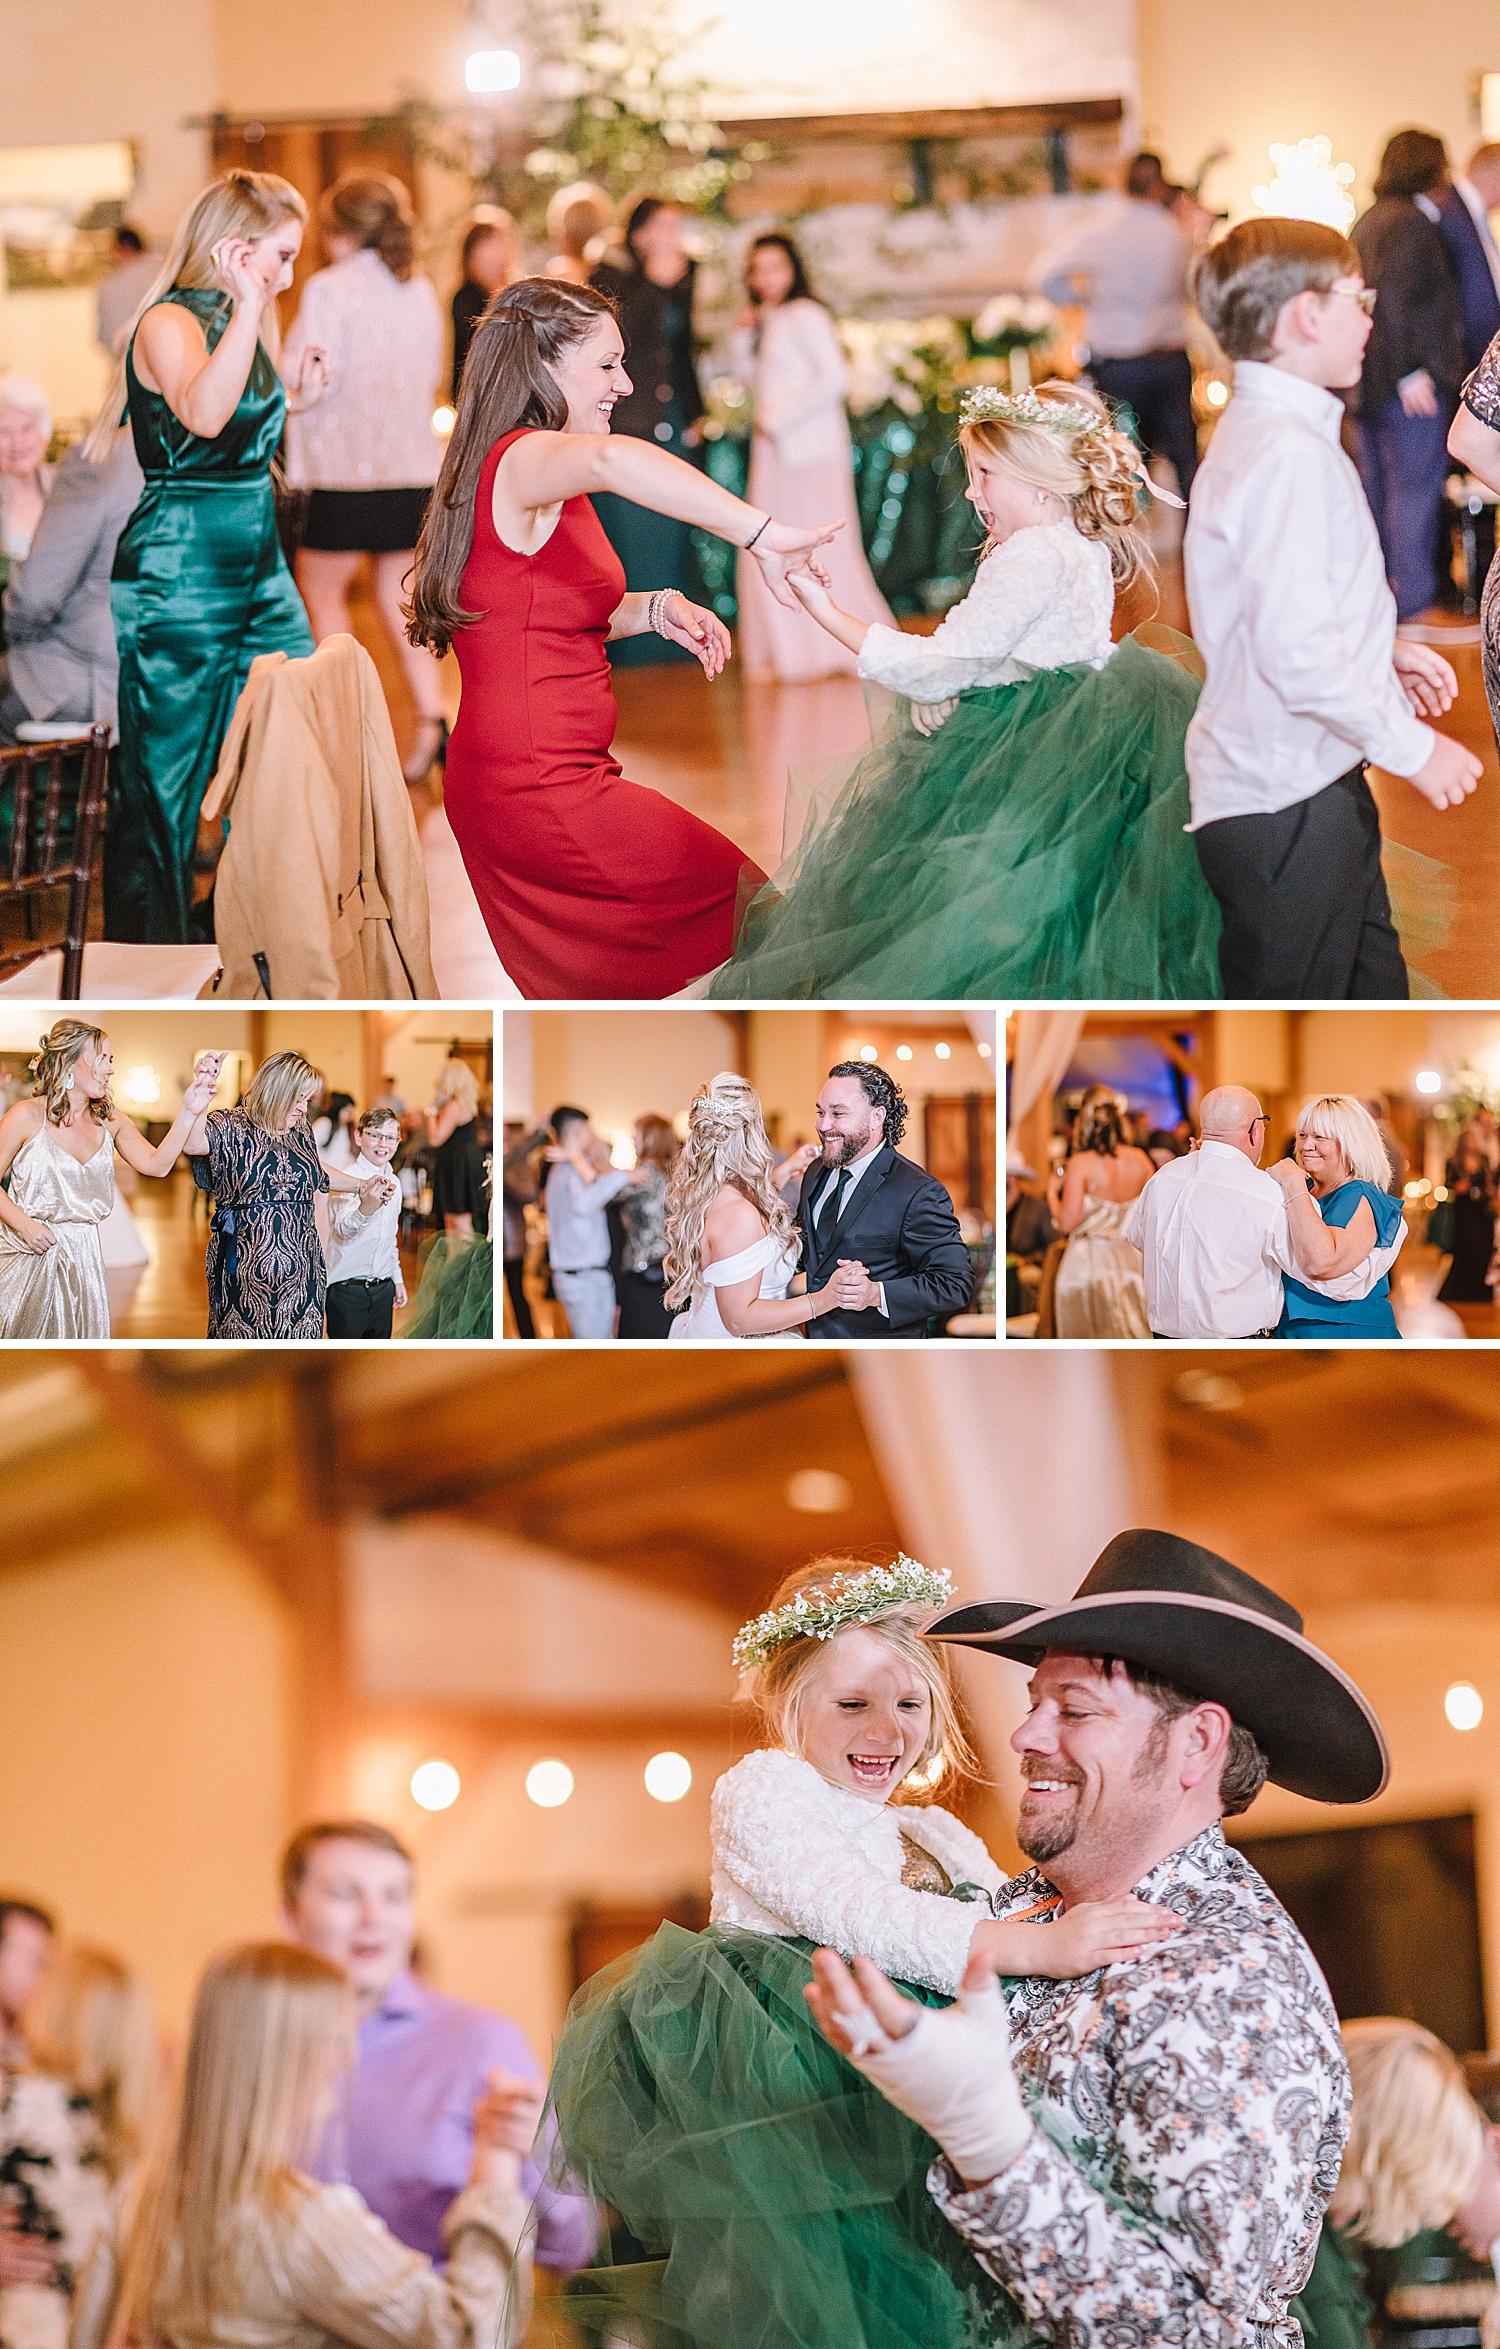 Magnolia-Halle-Wedding-San-Antonio-Texas-Bride-Grom_0078.jpg